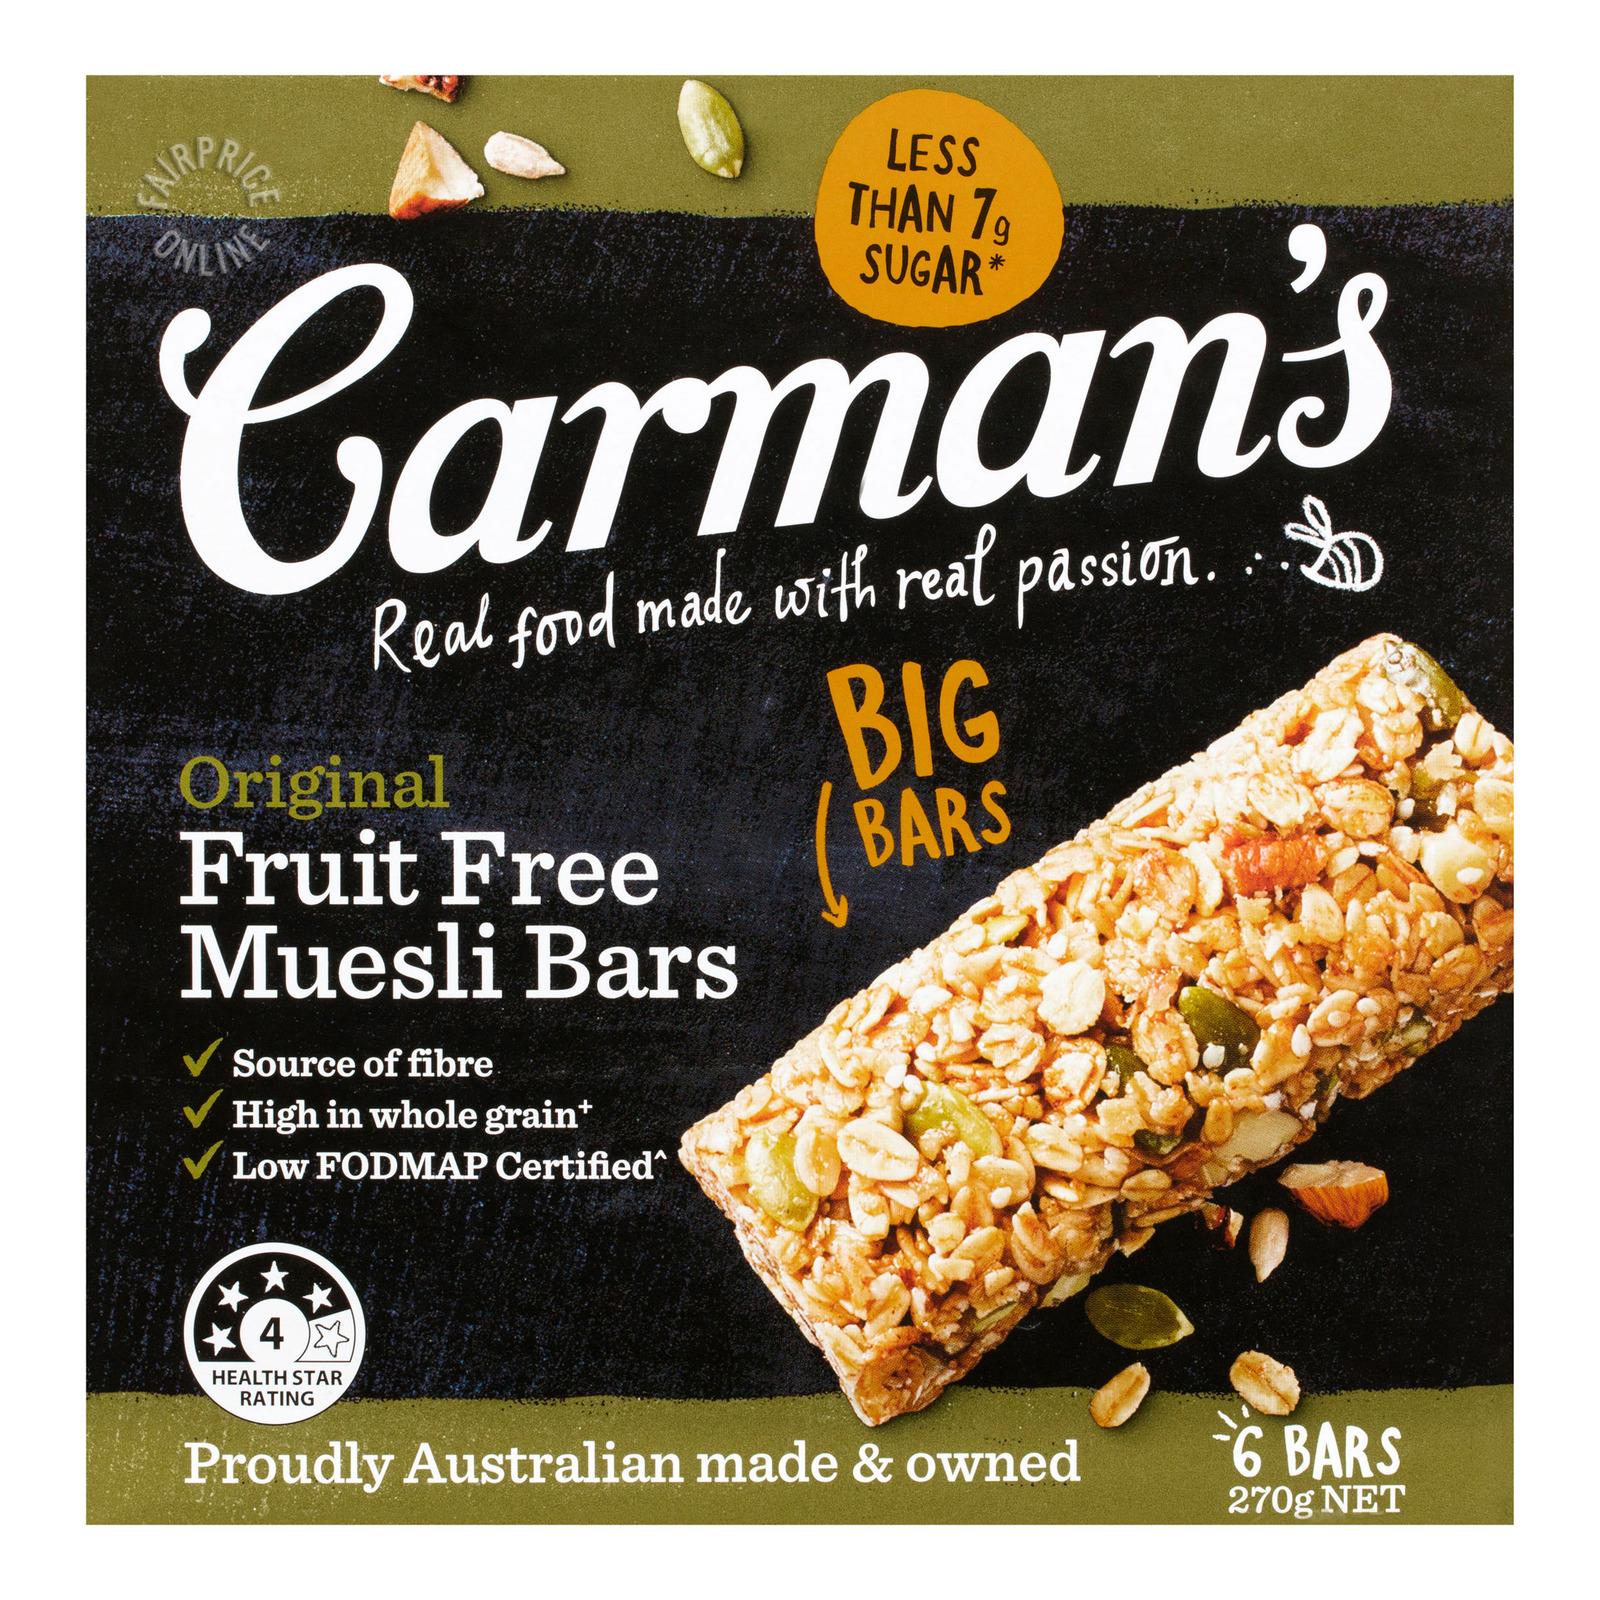 Carman's Muesli Bars - Original (Fruit Free)